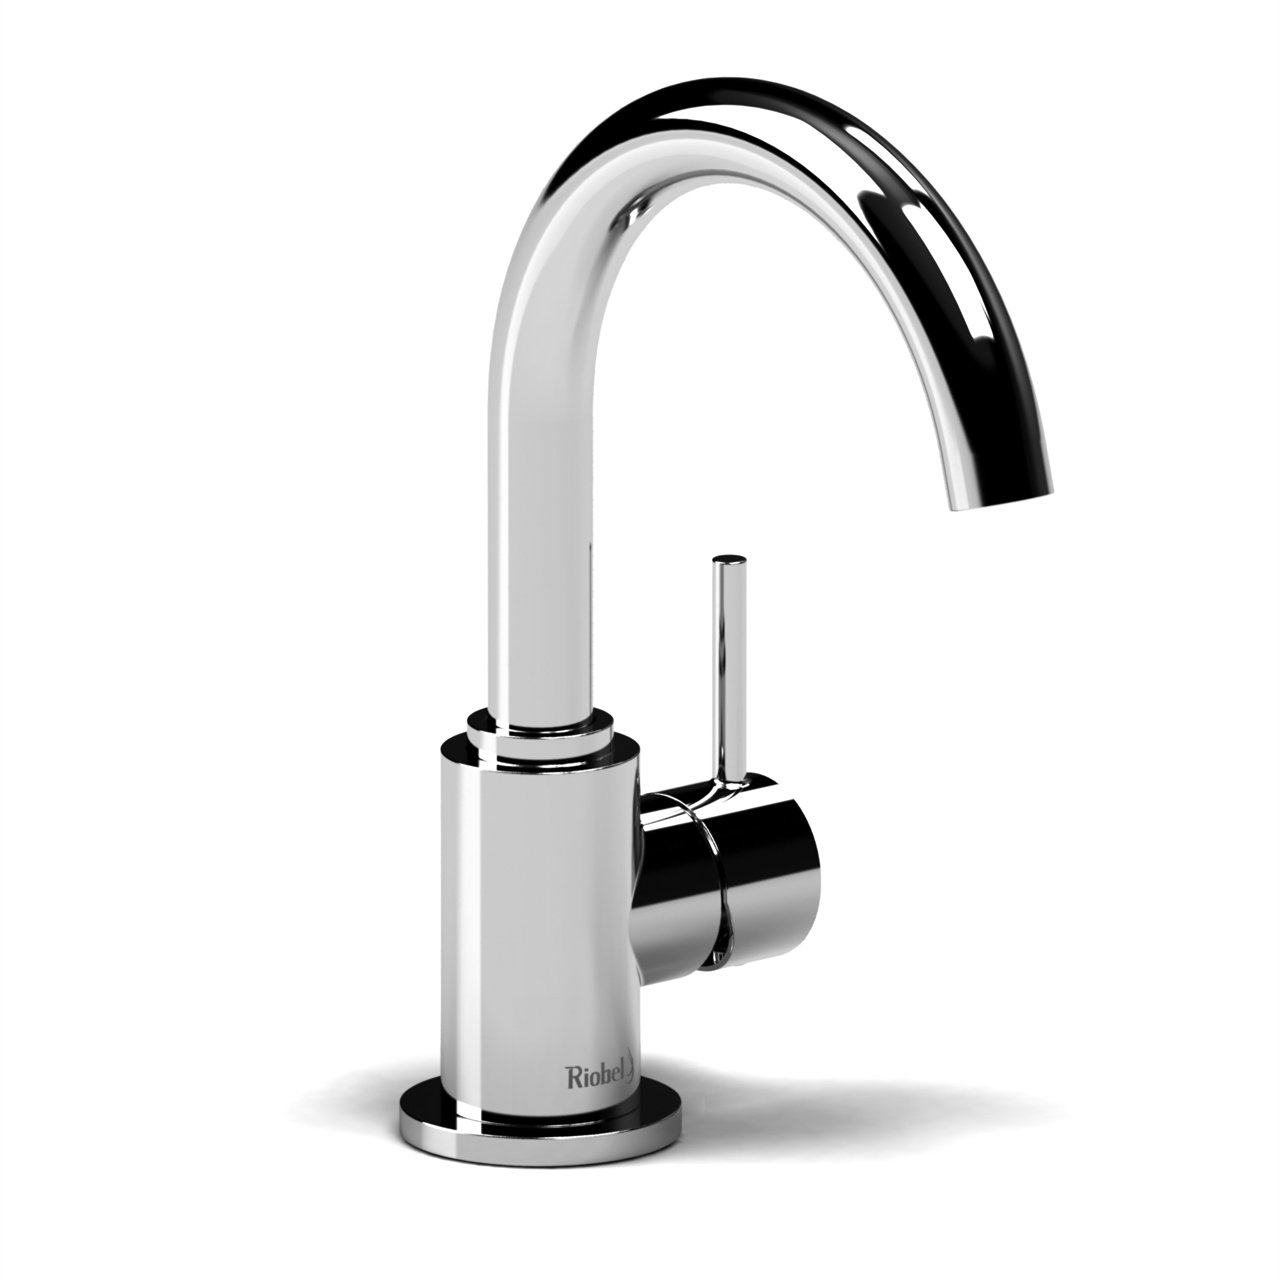 Kitchen Faucets Canada Shipping Cambria Quartz: Riobel Single Hole Kitchen Faucet Including Bora BO701